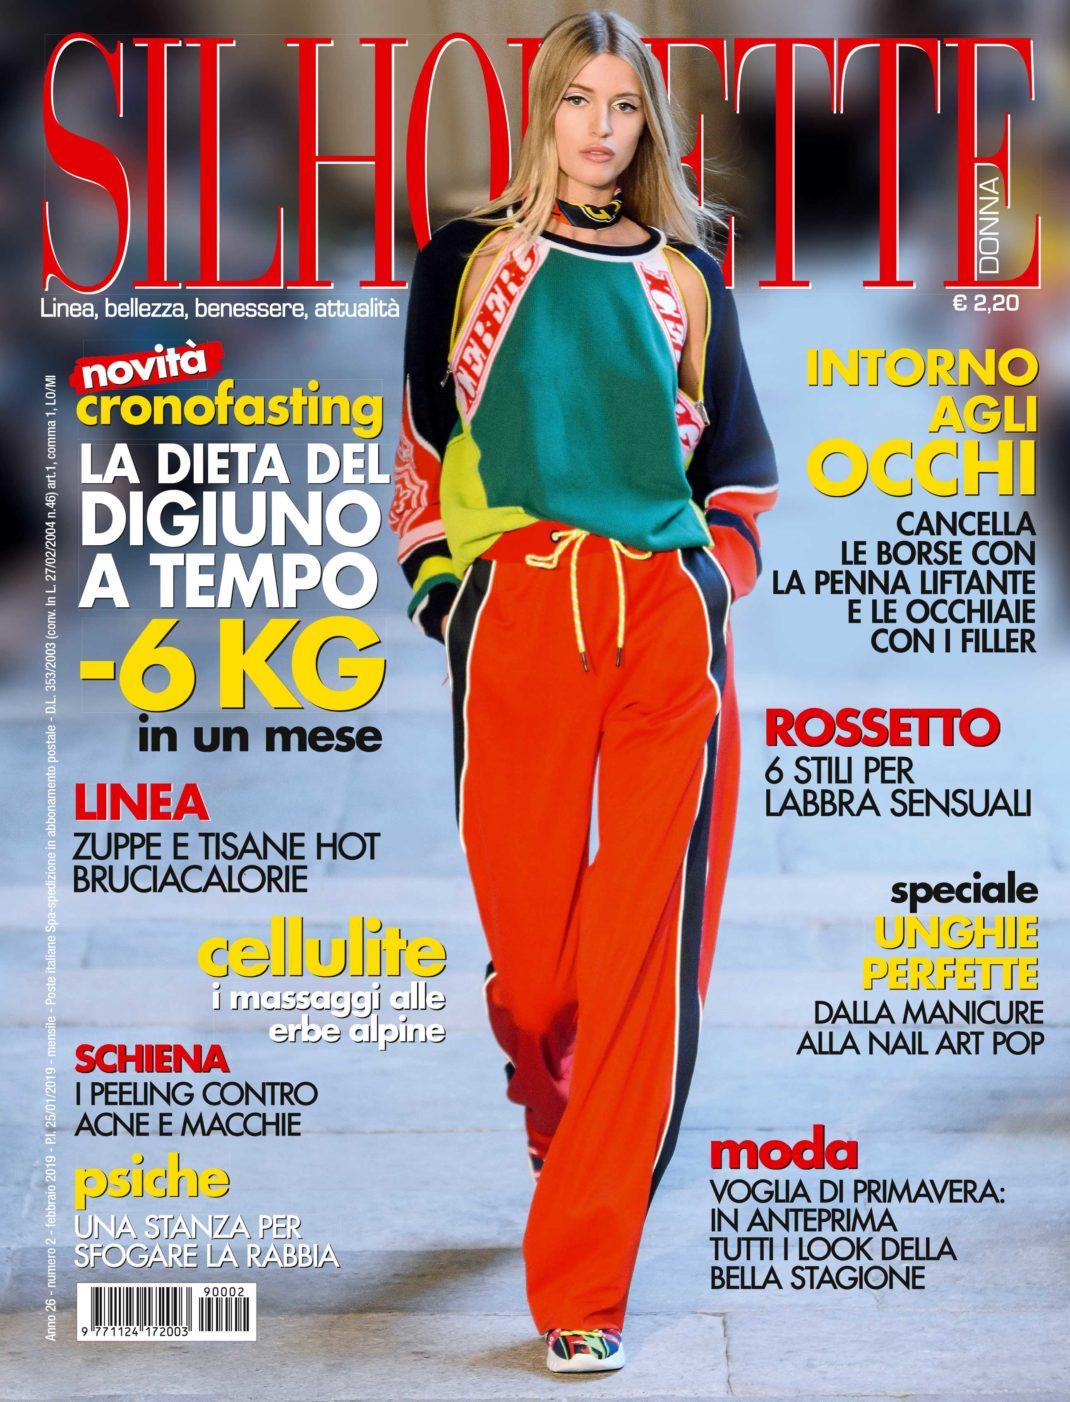 COVER-SLD FEBBRAIO 2019